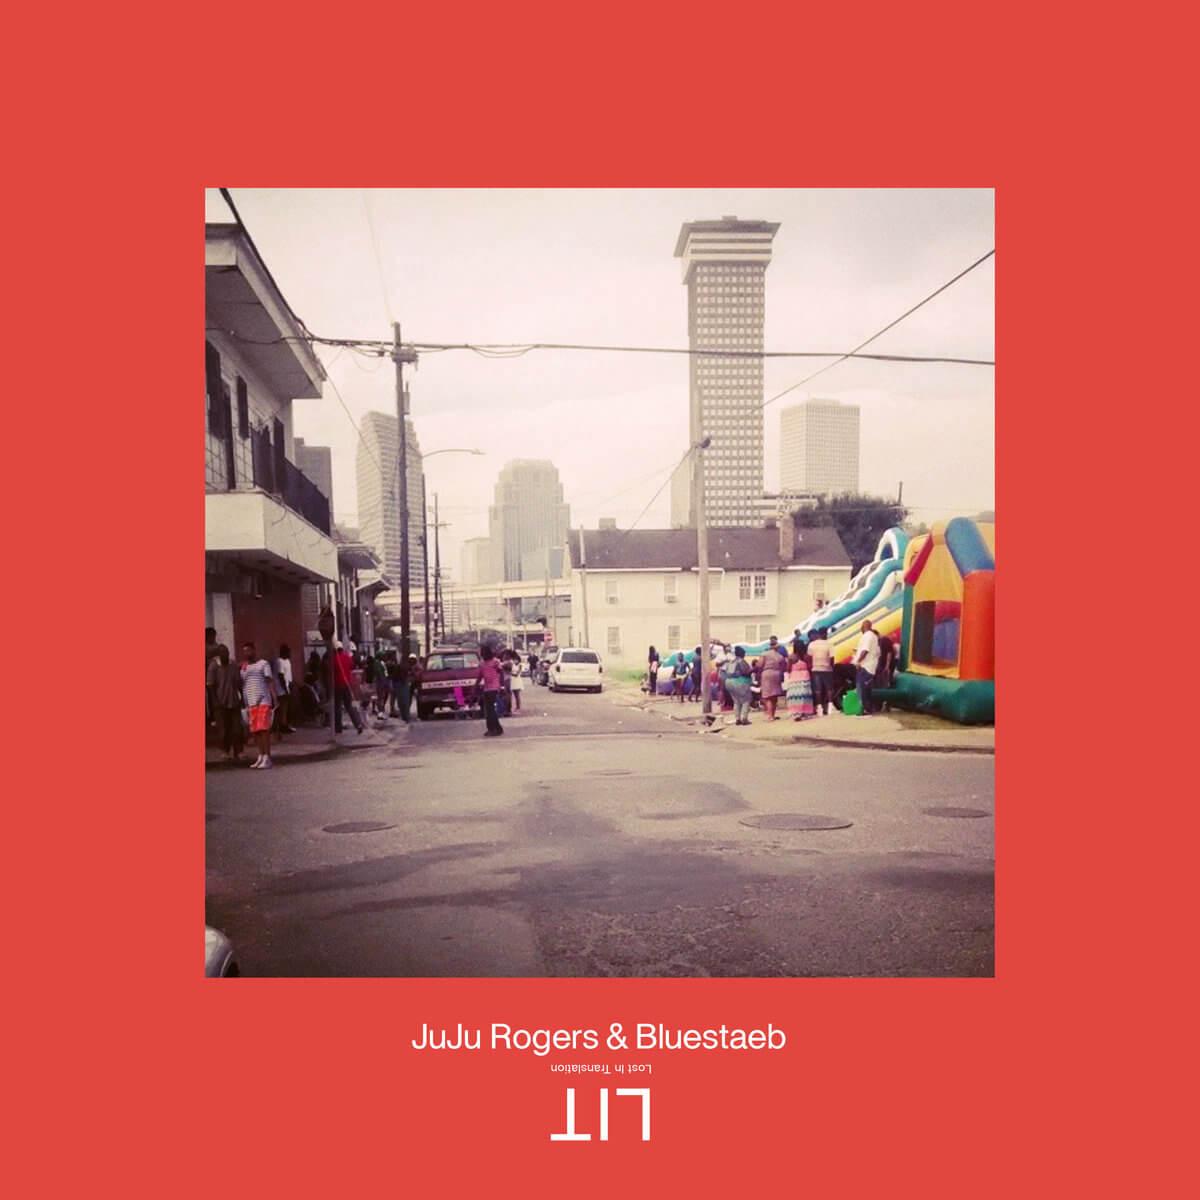 JuJu Rogers & Bluestaeb -  LIT Lost In Translation